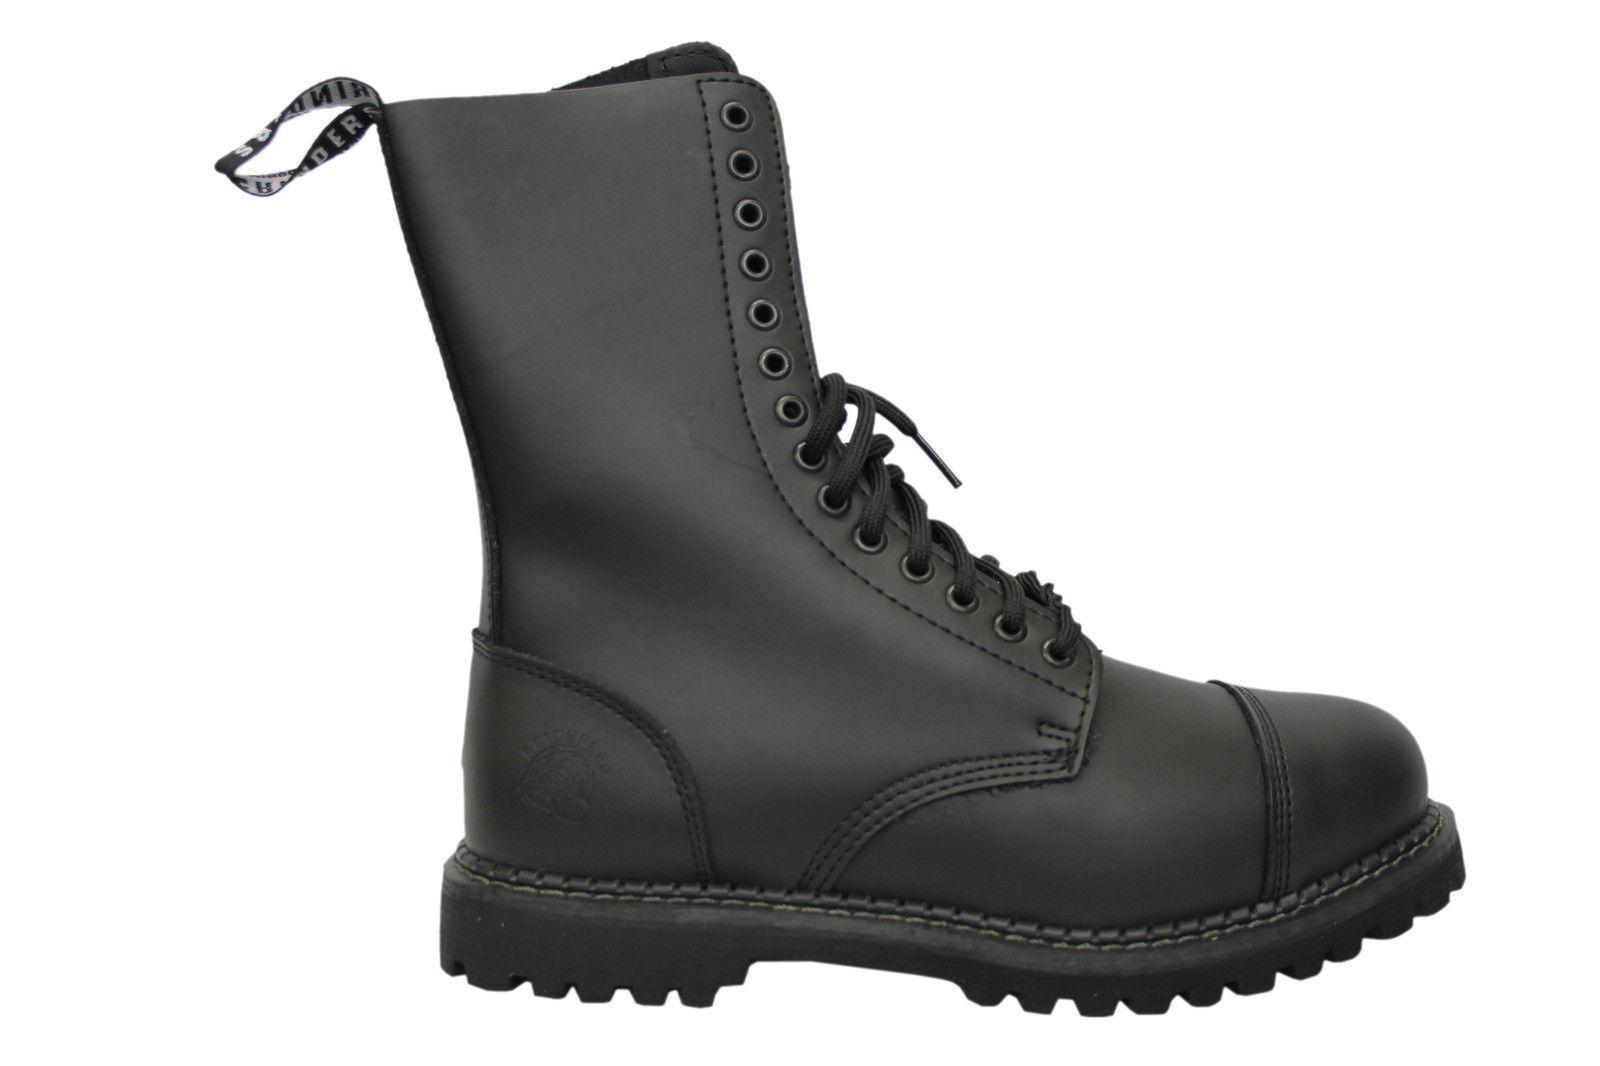 Grinders Hole Herald CS Negro 14 Hole Grinders Hombres Ladies Safety Steel Toe botas b647dd